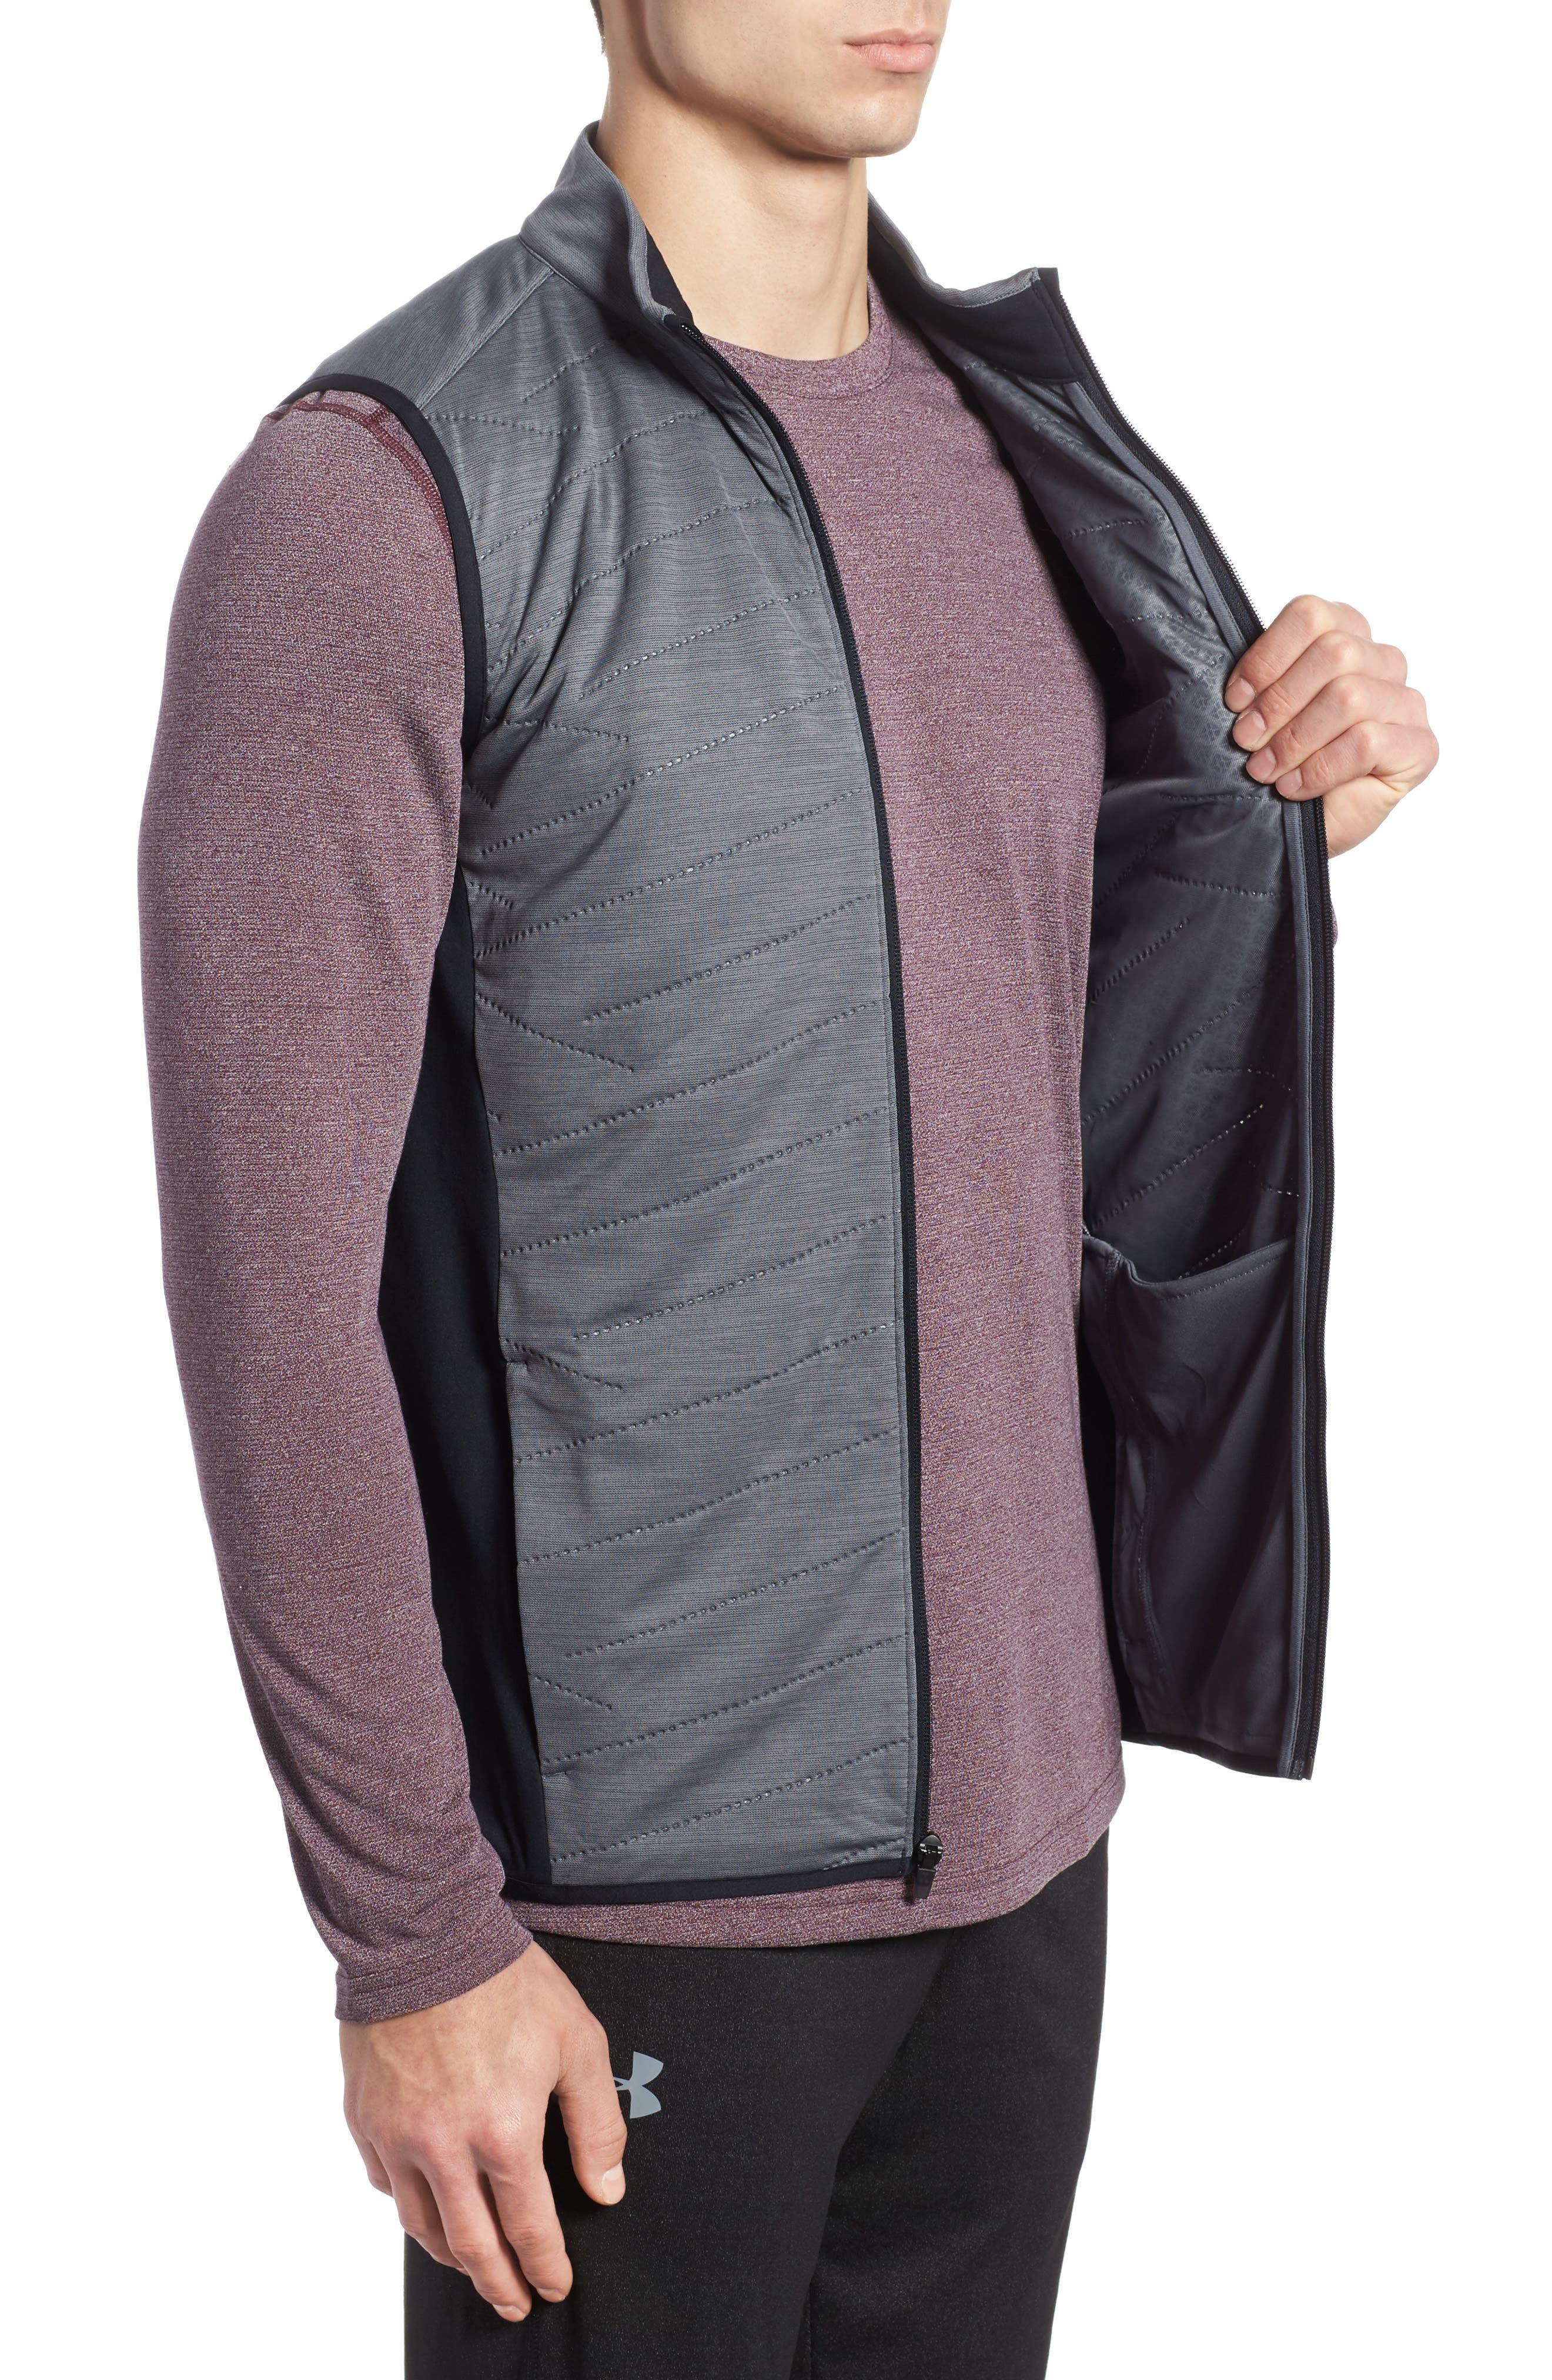 Reactor Hybrid Zip Vest,                             Alternate thumbnail 3, color,                             Rhino Grey / Black / Grey